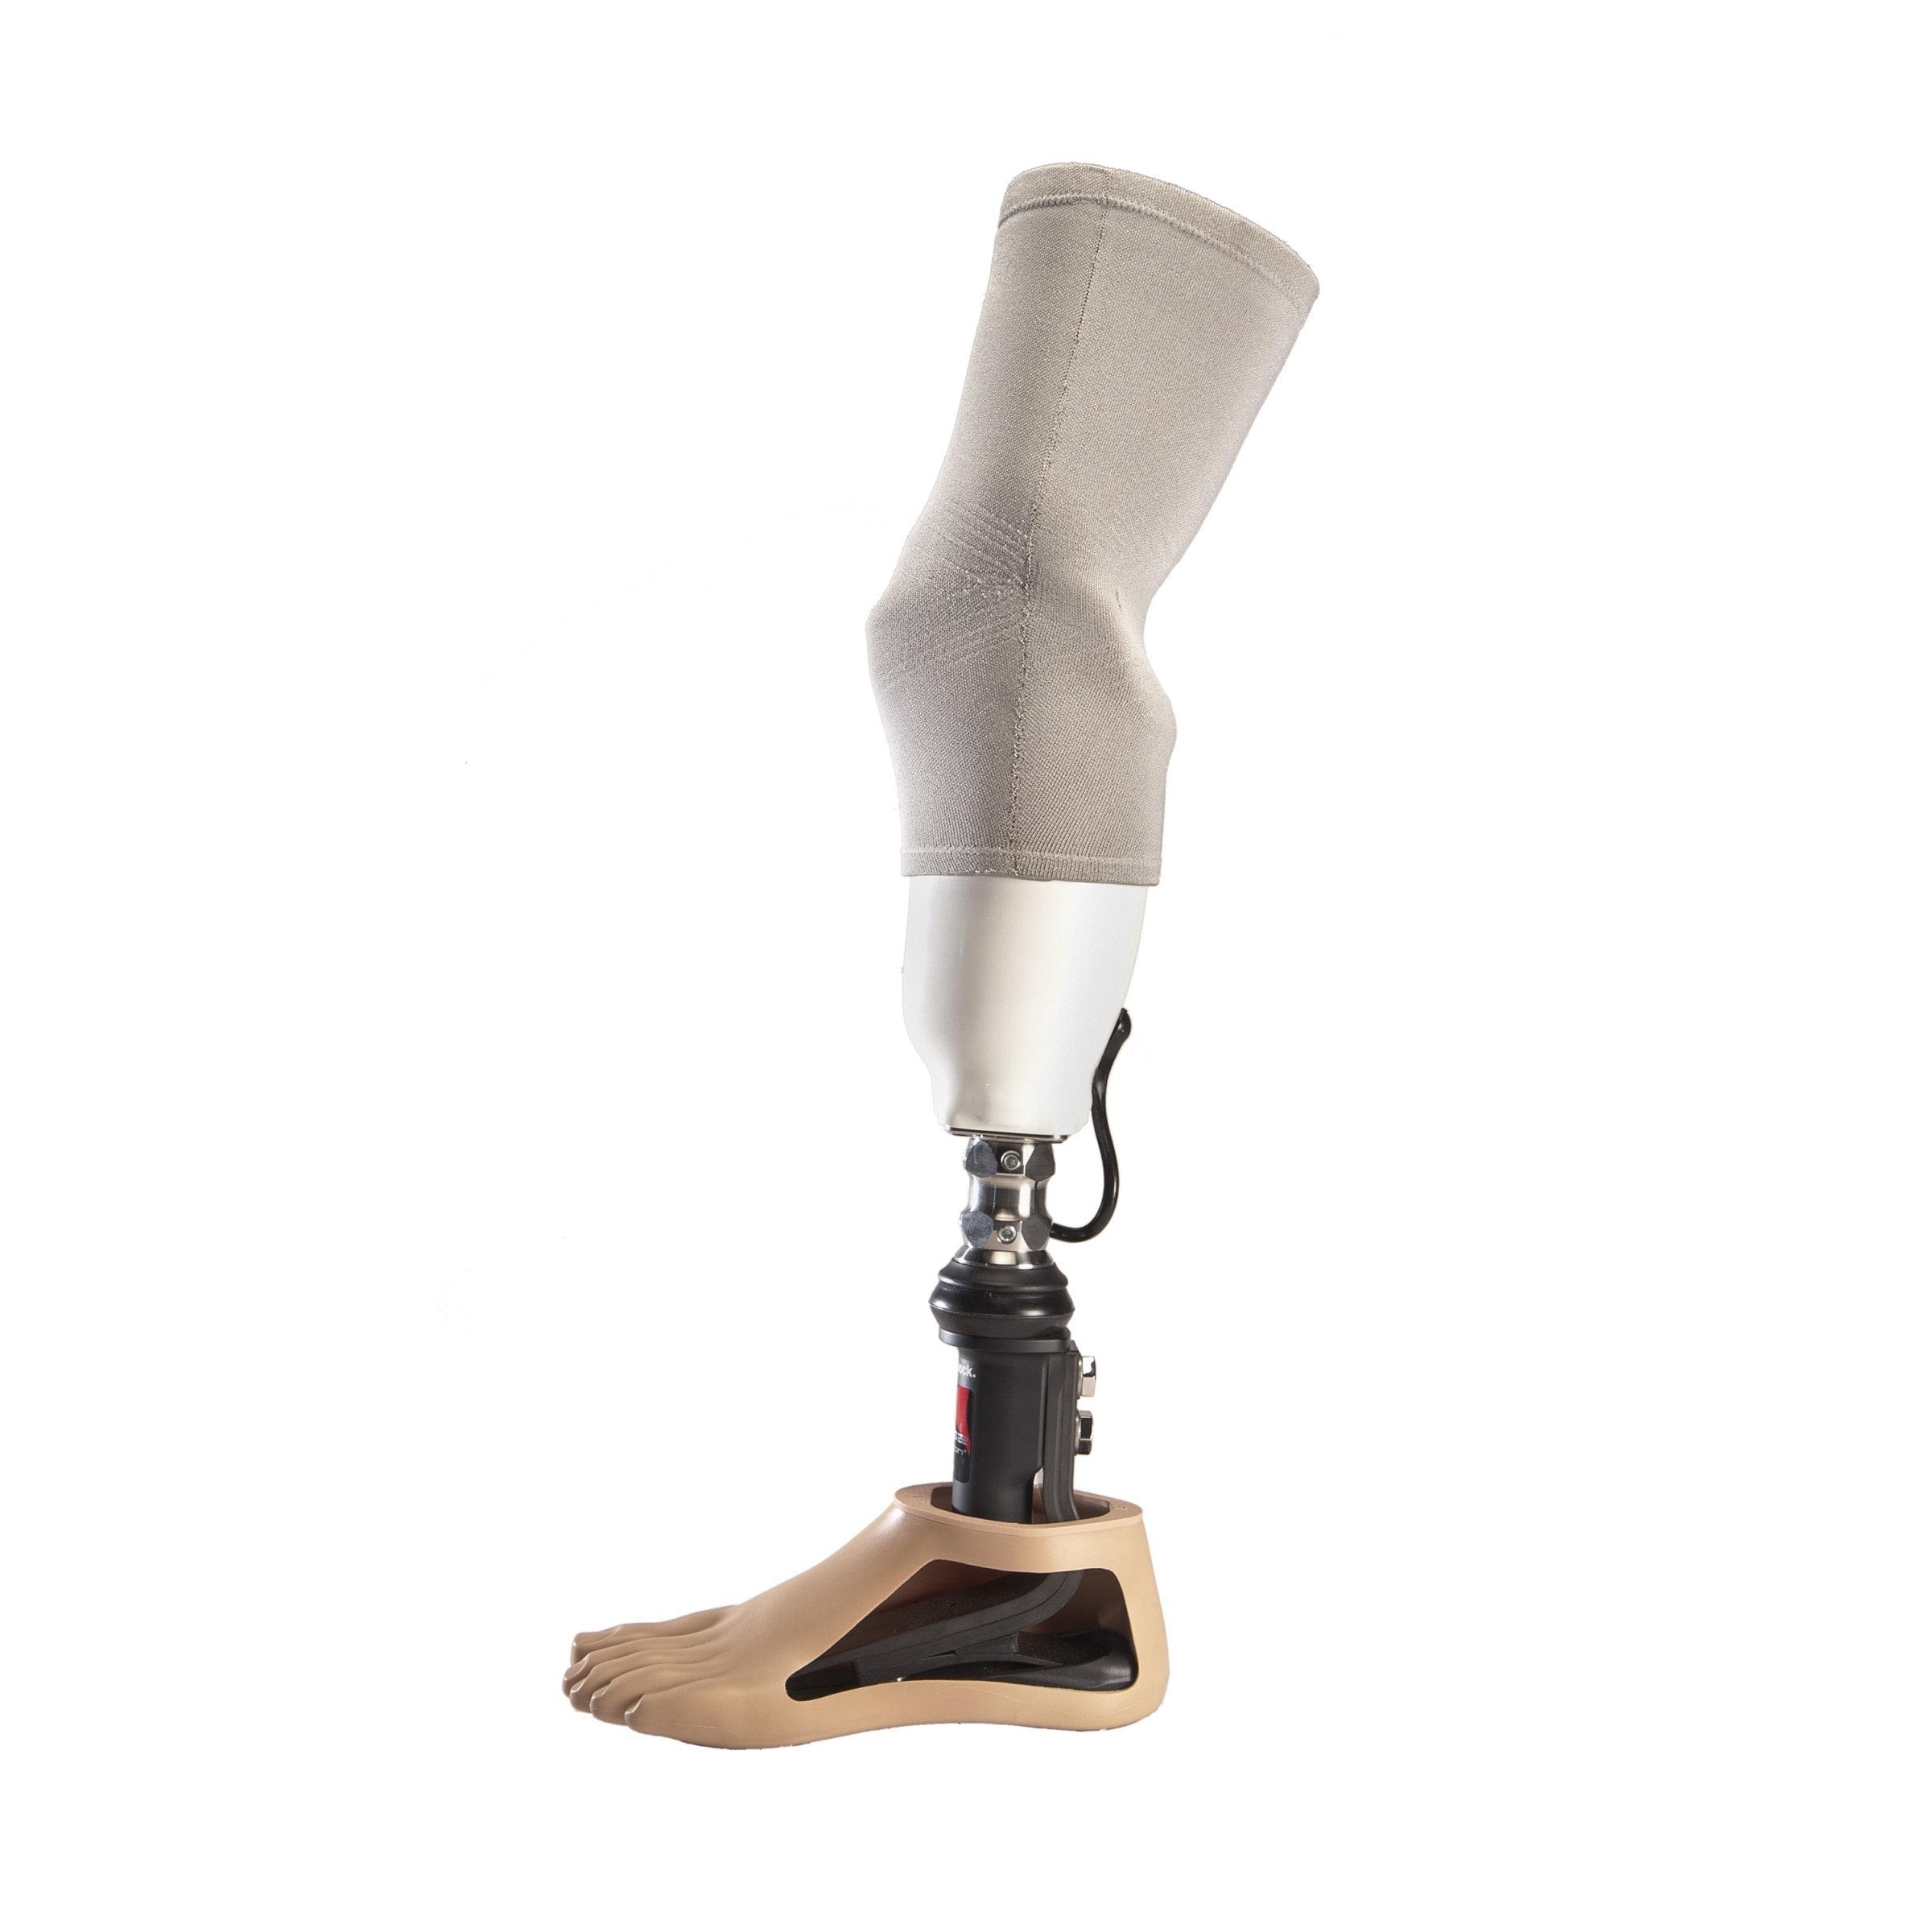 Light Weight Artificial Leg   Knee and Below Knee Prosthesis   Ottobock IN